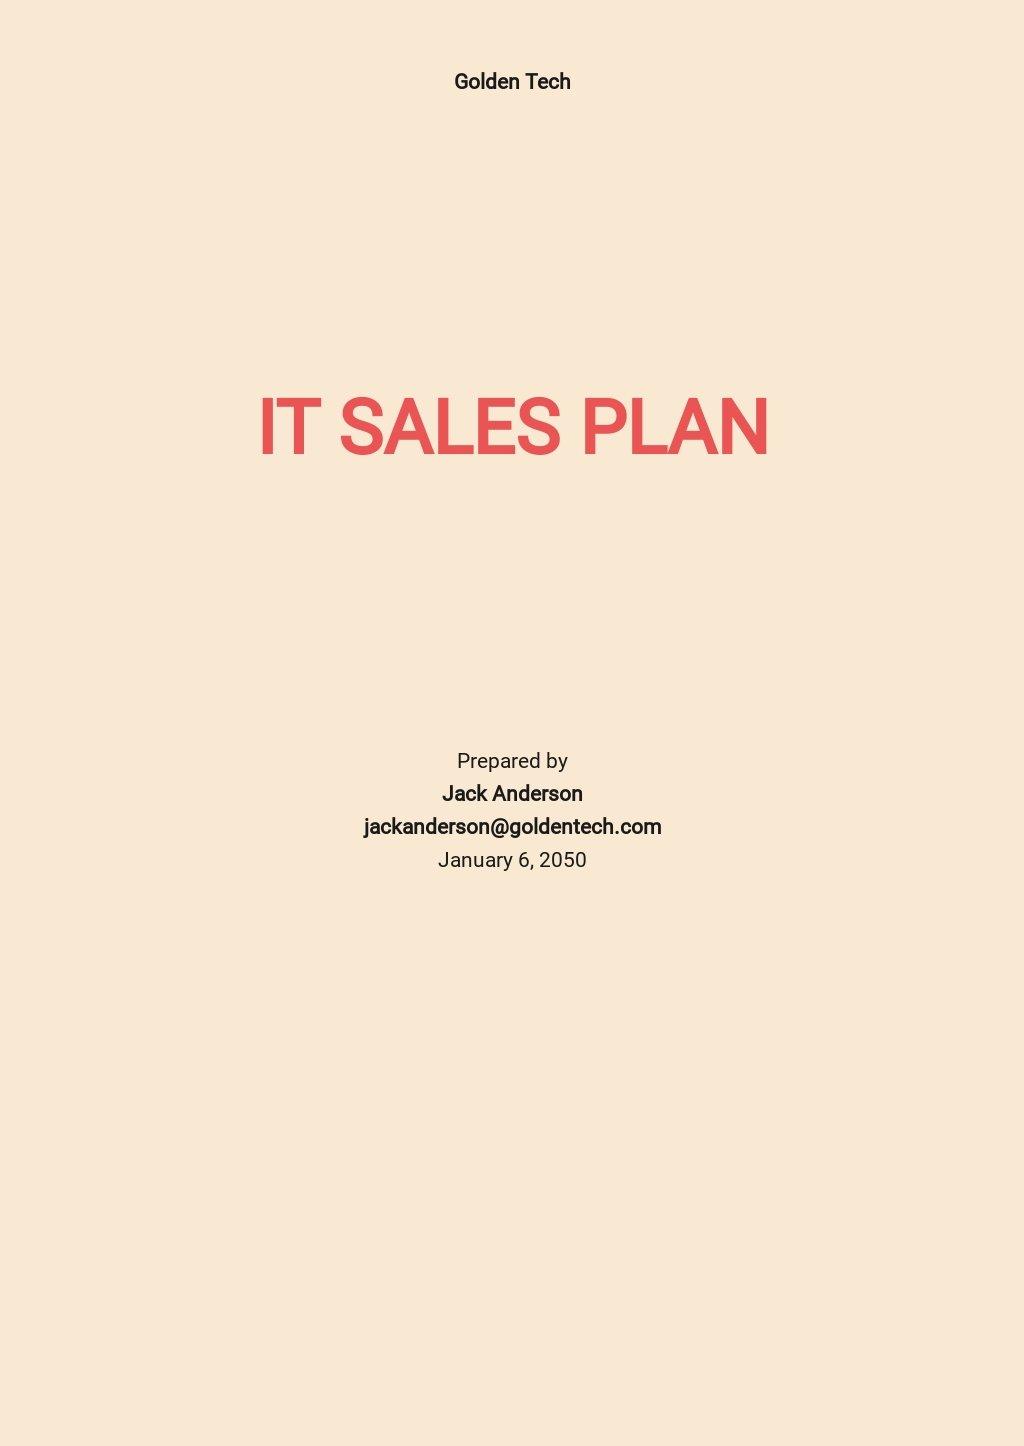 Free Sample IT Sales Plan Template.jpe